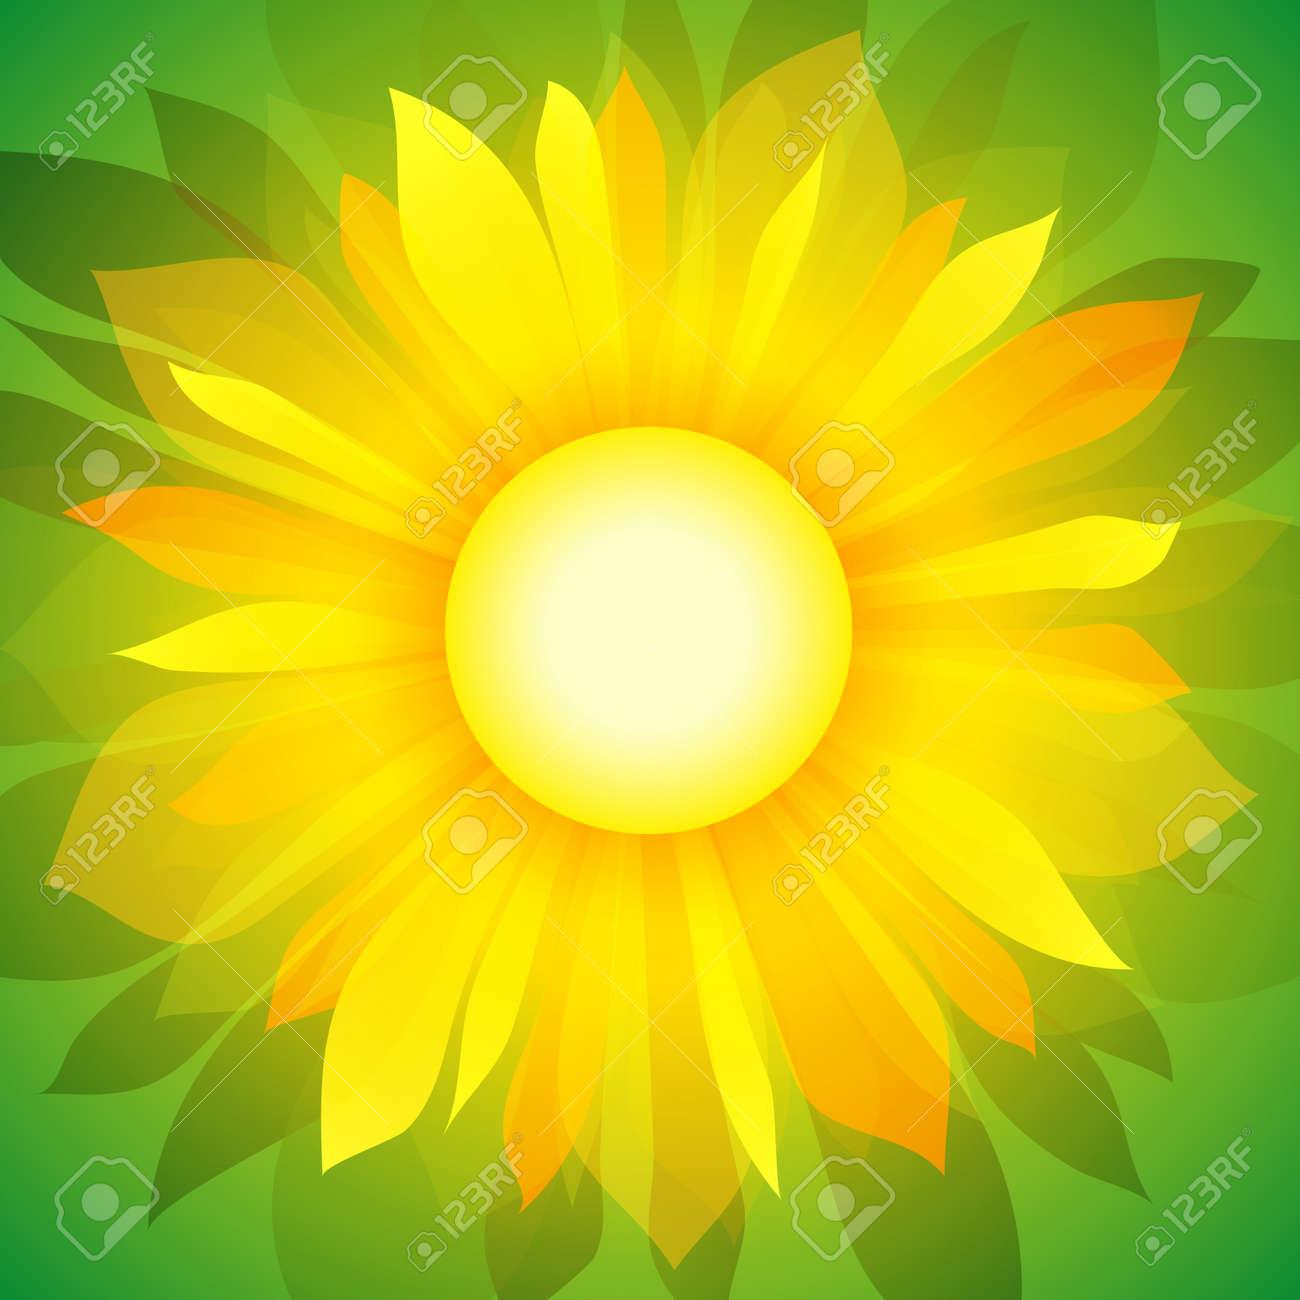 Sunflower on green background. Stock Vector - 10927933